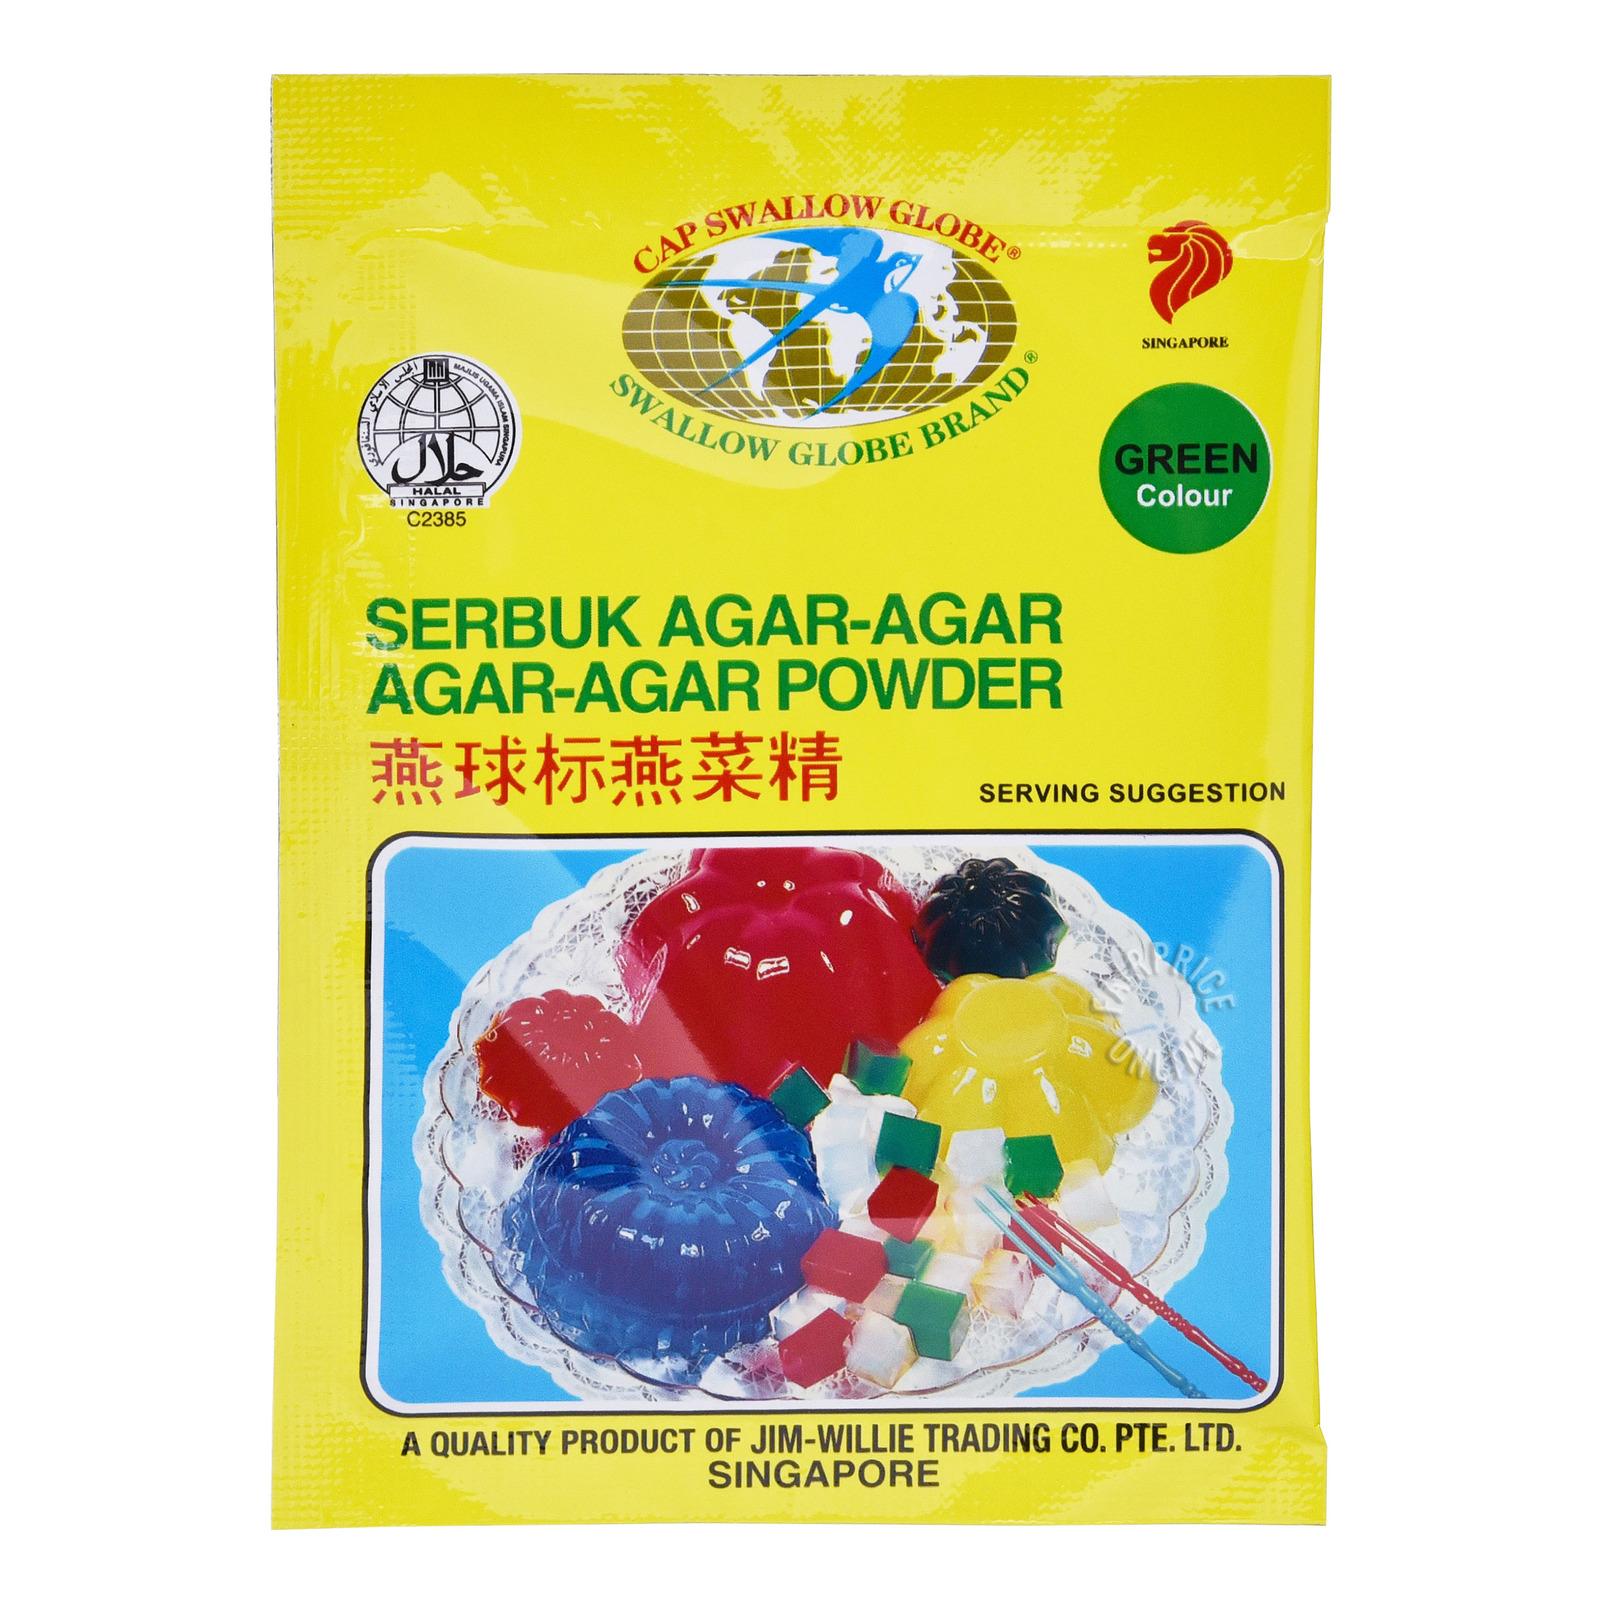 Swallow Agar Agar Powder - Green